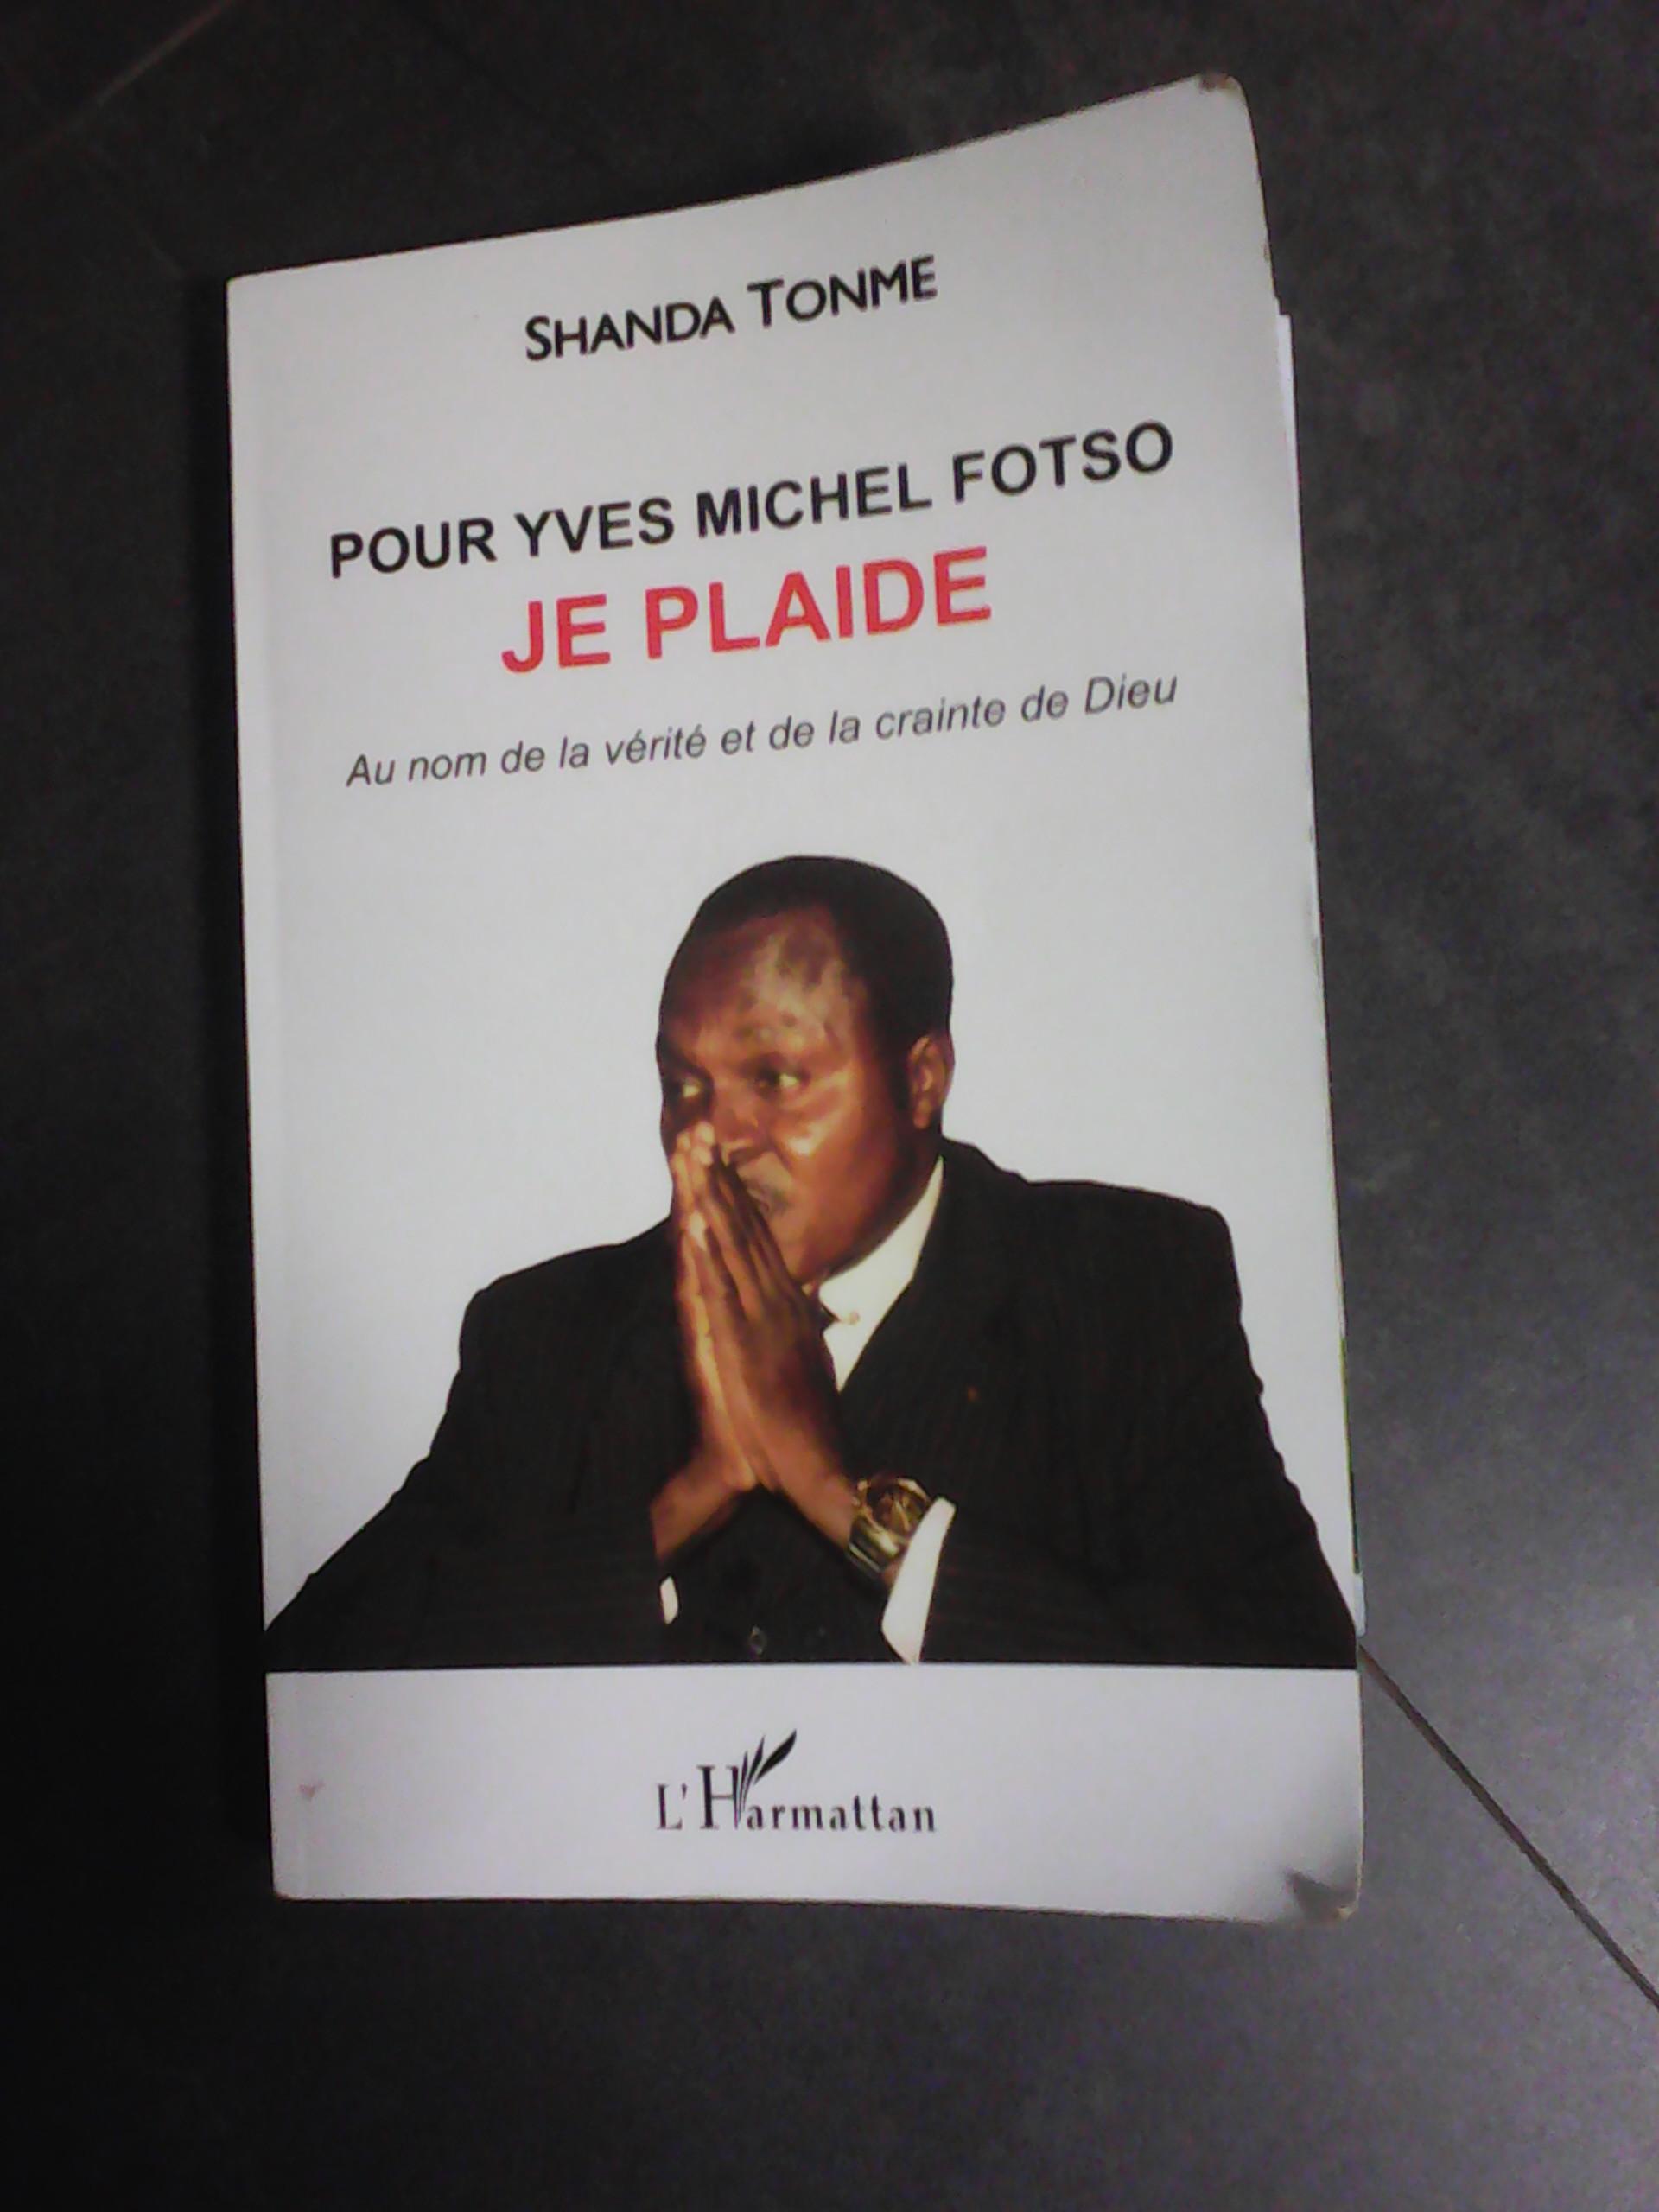 Cameroun:Les nouvelles preuves de l'innocence de Yves Michel Fotso